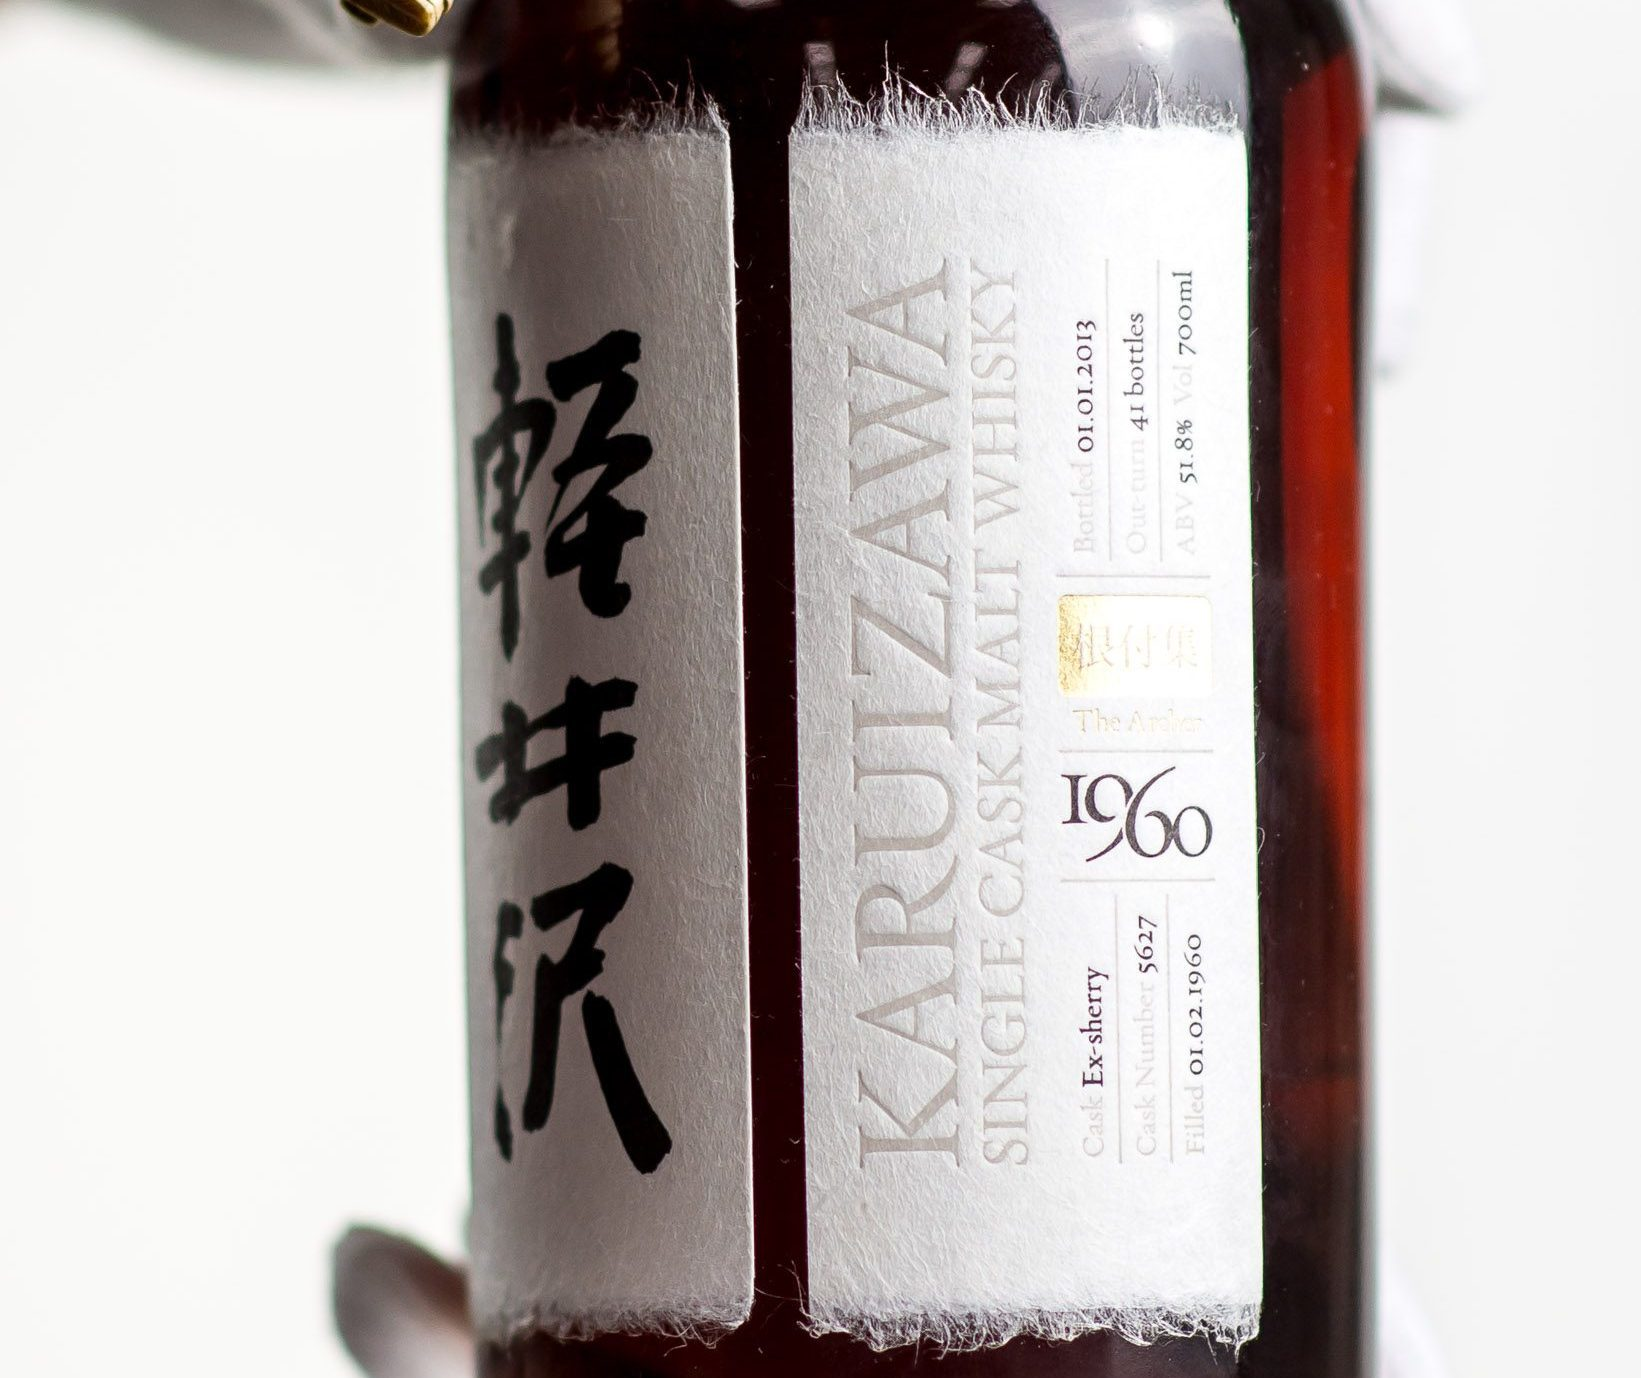 Rare Karuizawa whisky will go under the hammer at auction.